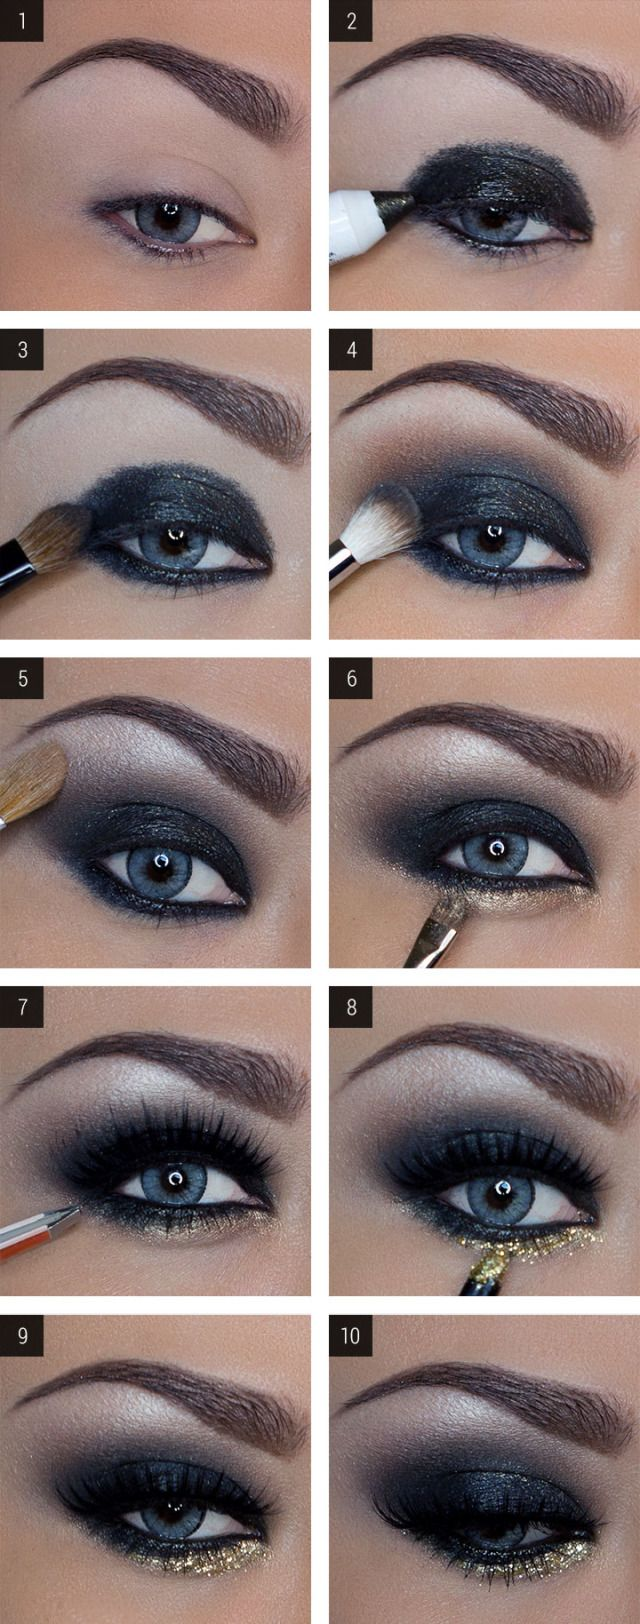 How to do a shimmery smoky eye like a pro smoky eye vegas and eye how to do a shimmery smoky eye like a pro baditri Image collections